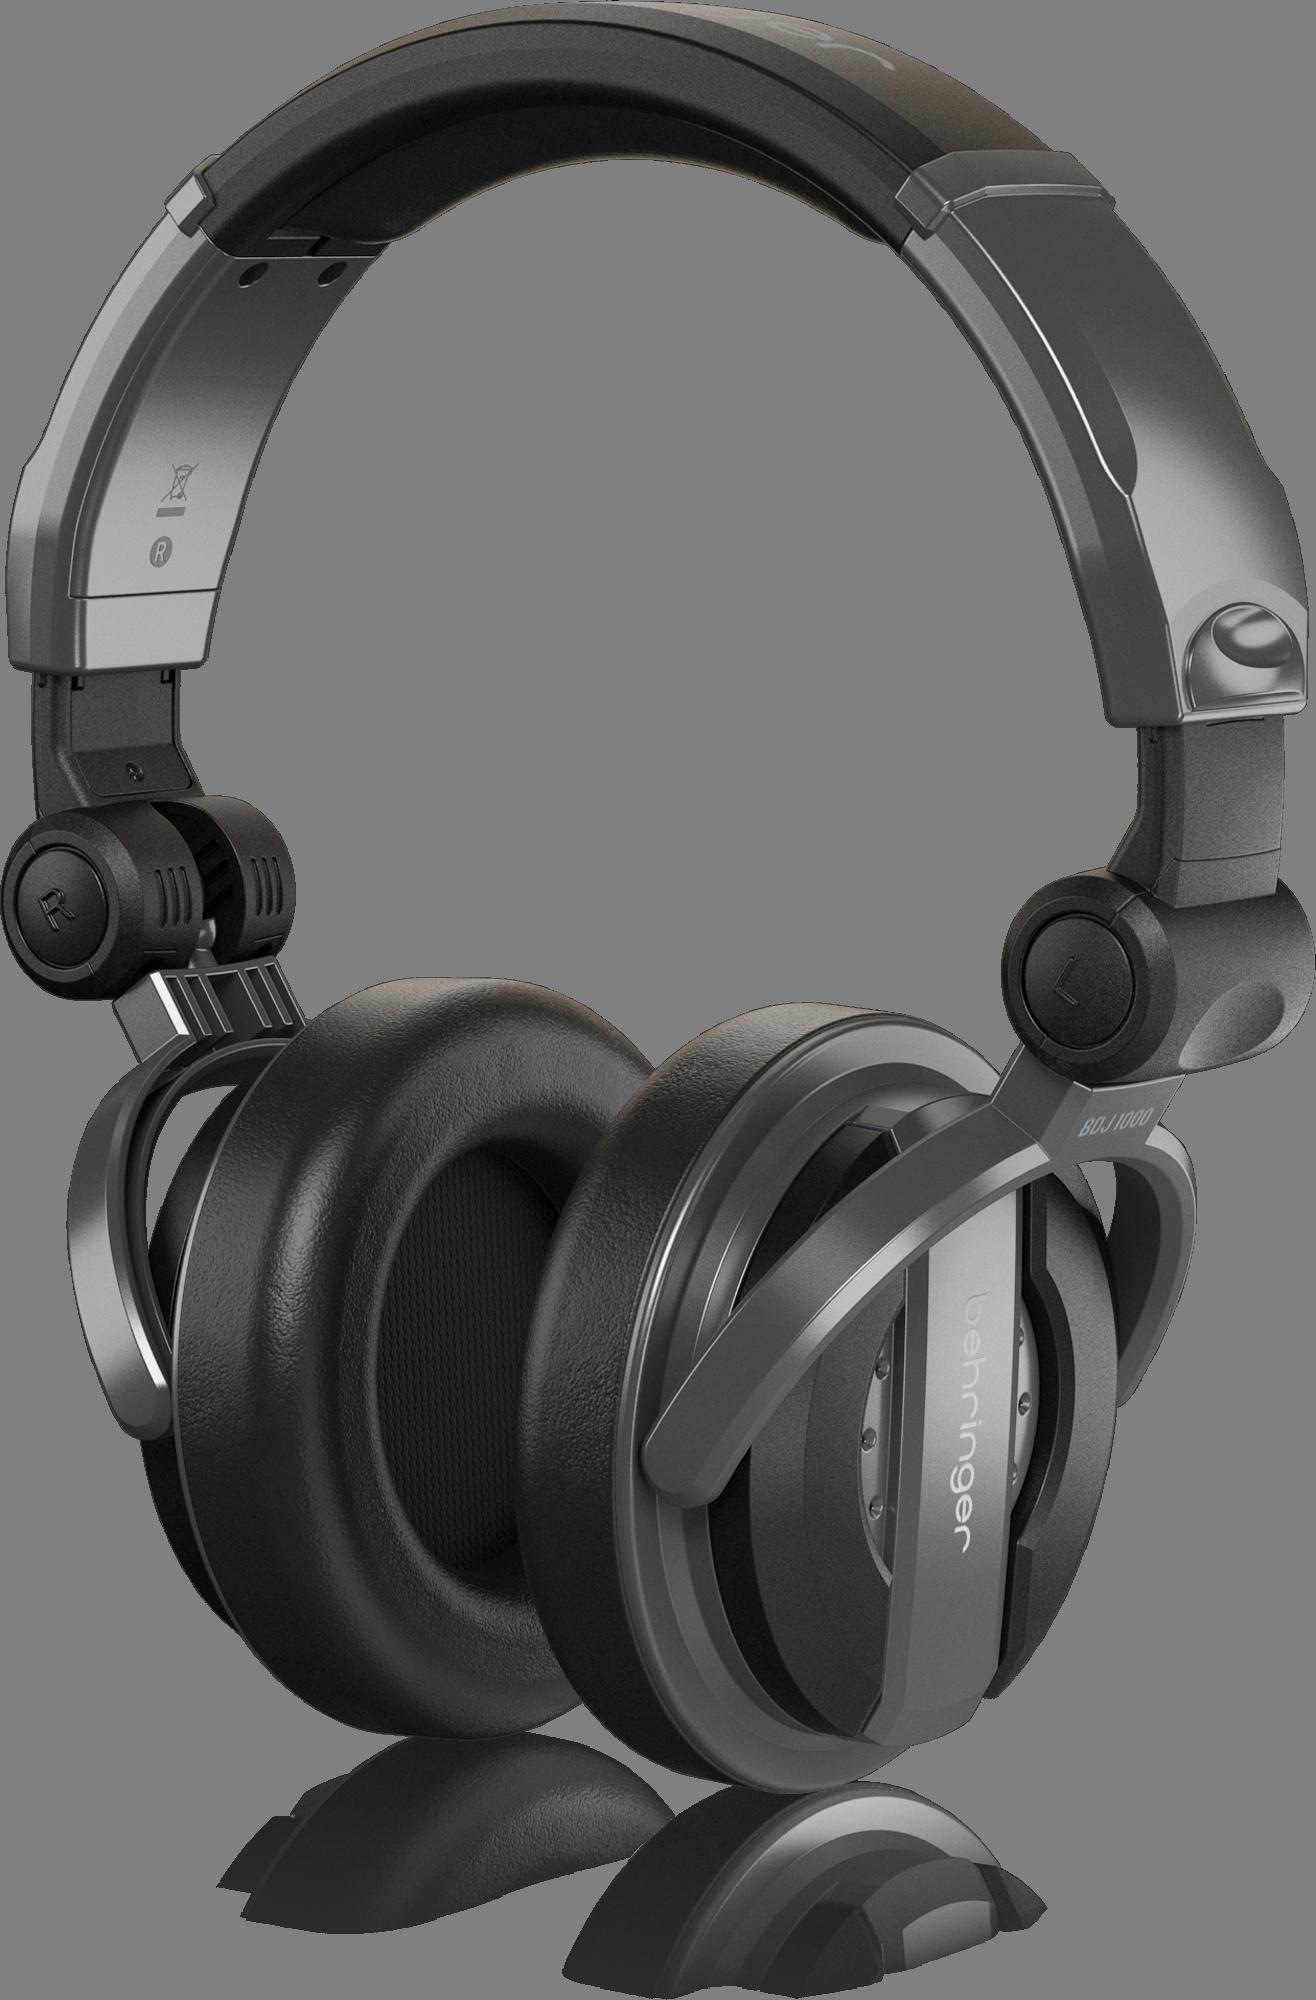 Behringer BDJ 1000 - Headphone